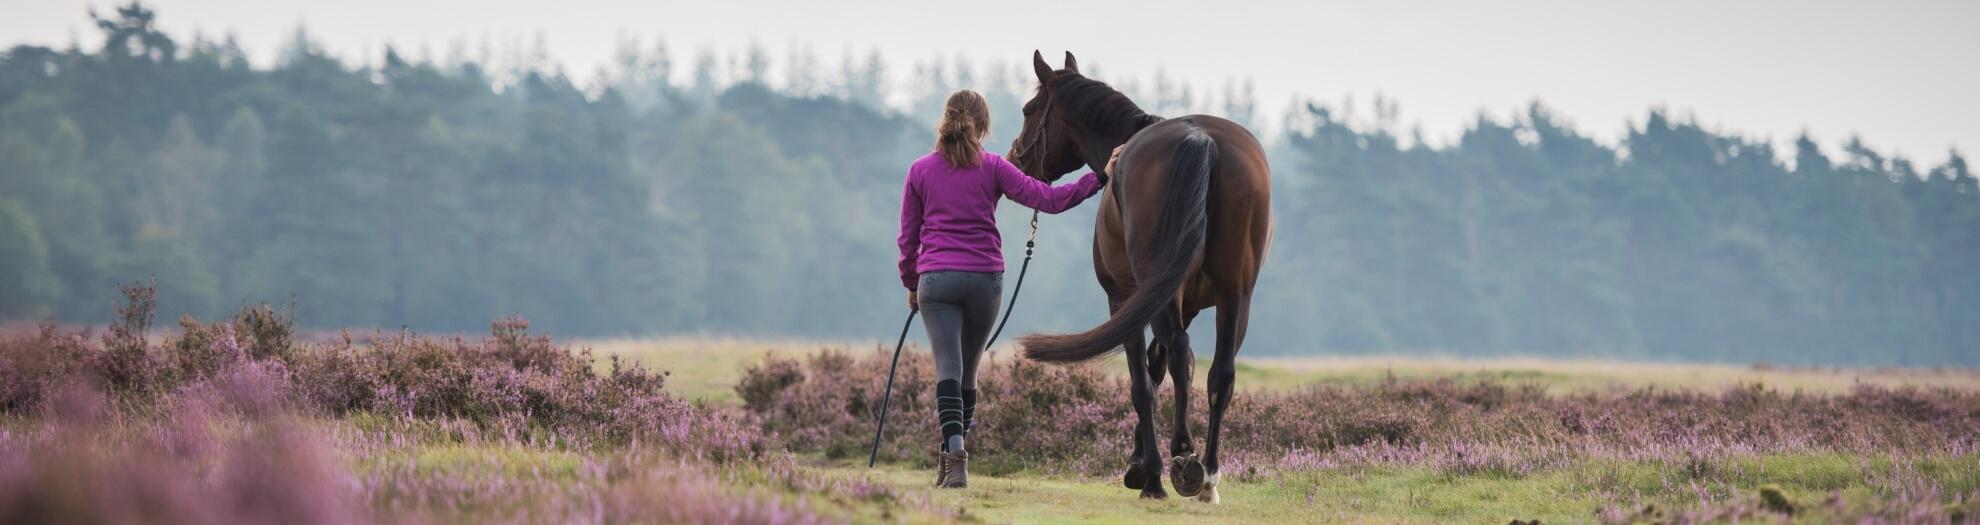 Speedcoachsessie - Horse Power Life Power